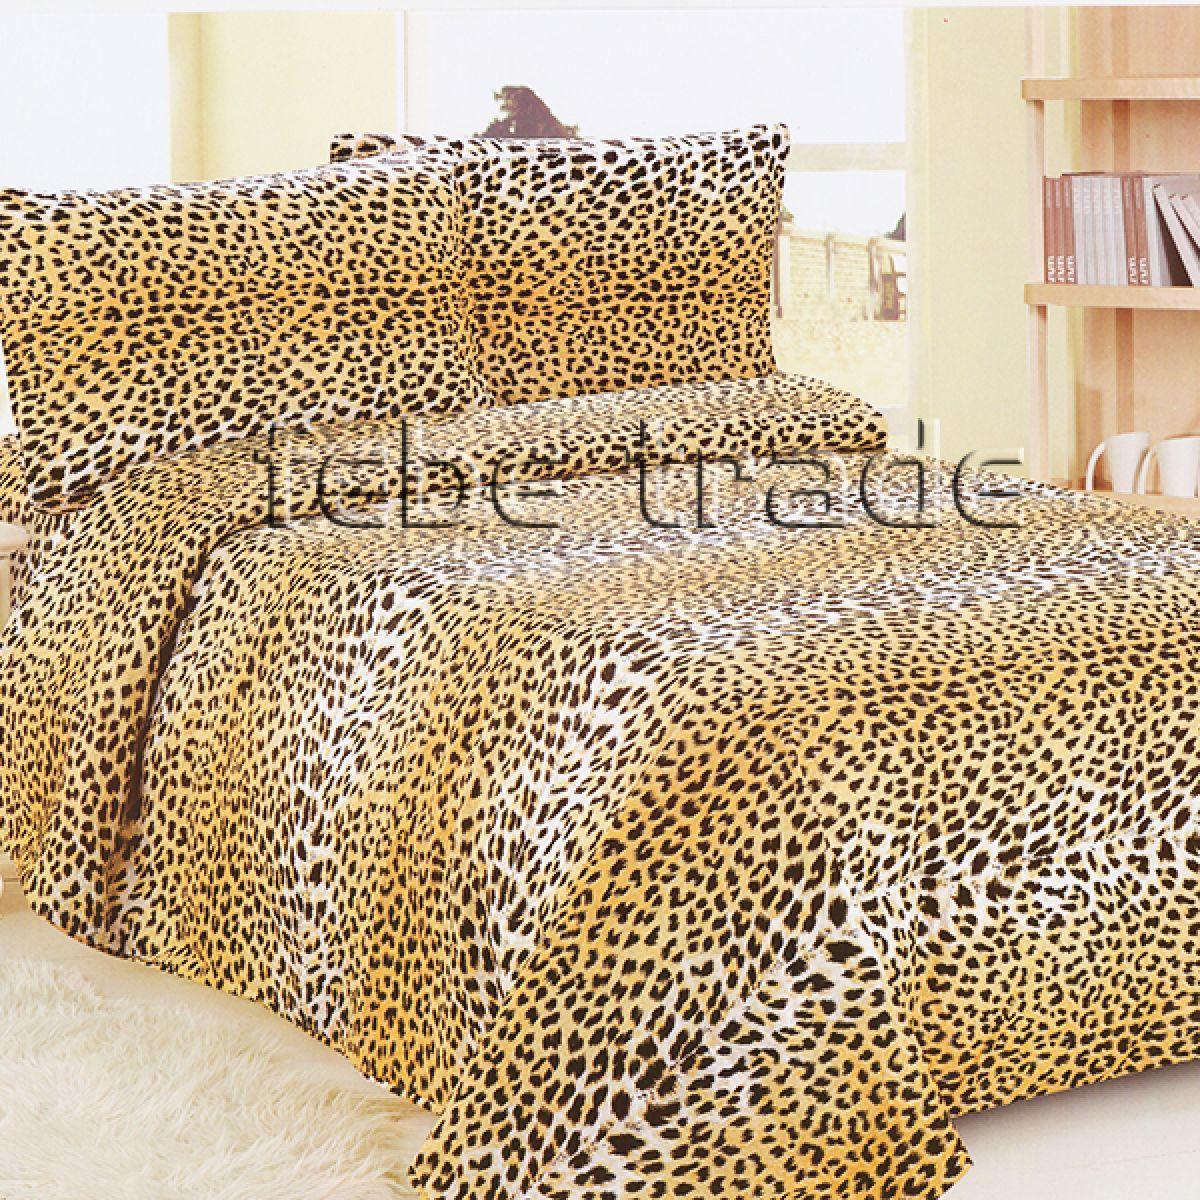 Cheap Beddings - TPR-YP-449 - 220x200cm - 3 pcs